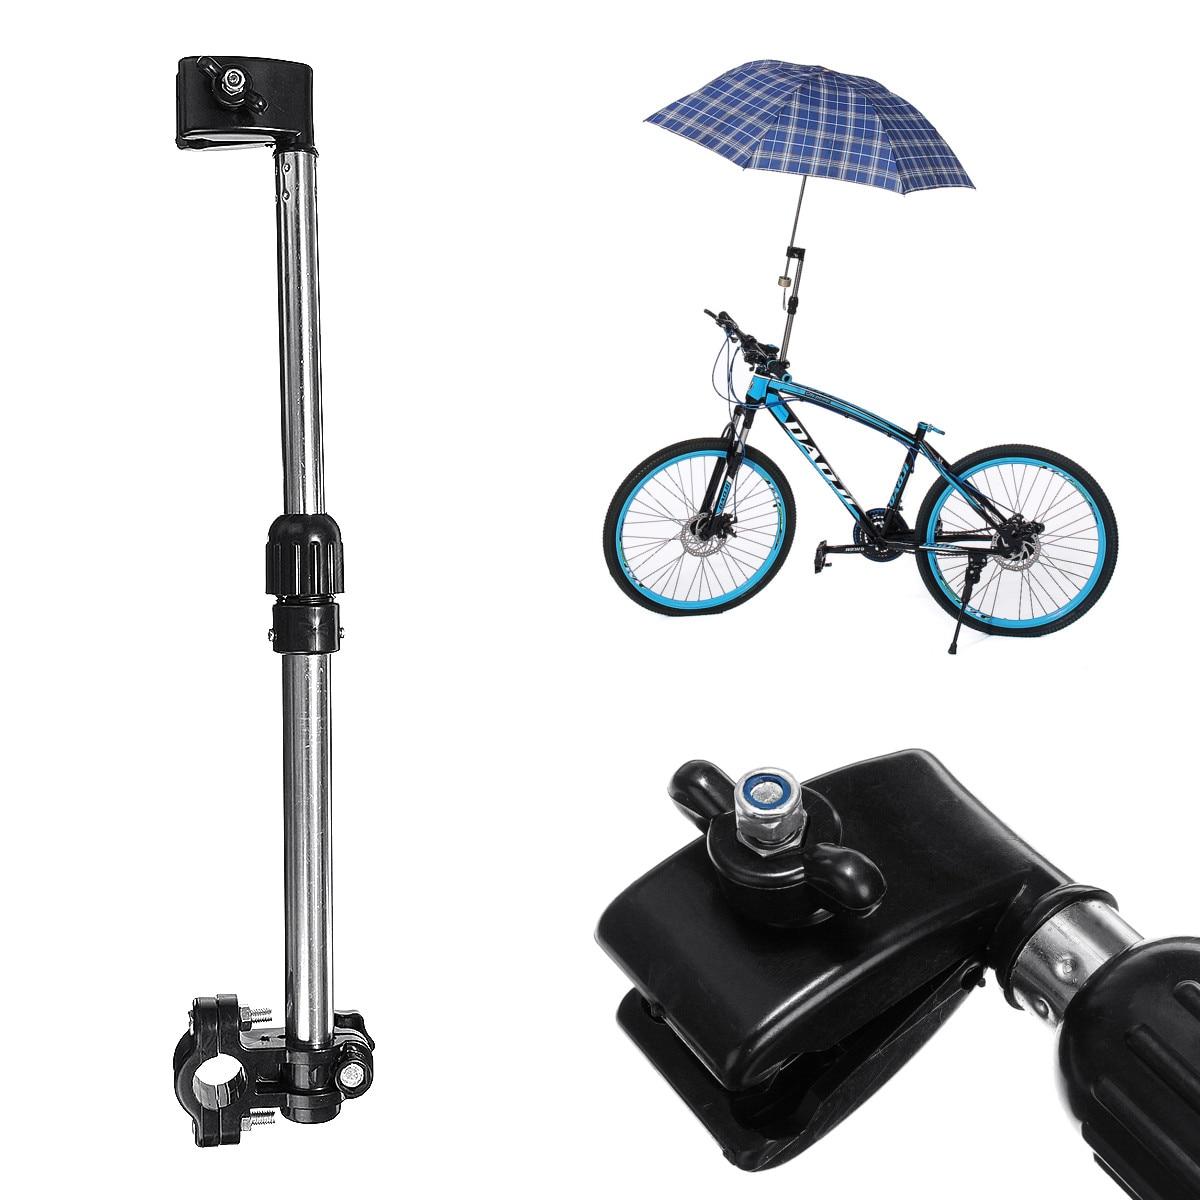 Bicycle Stroller Umbrella Stand New Holder Baby Stroller Pram Bracket